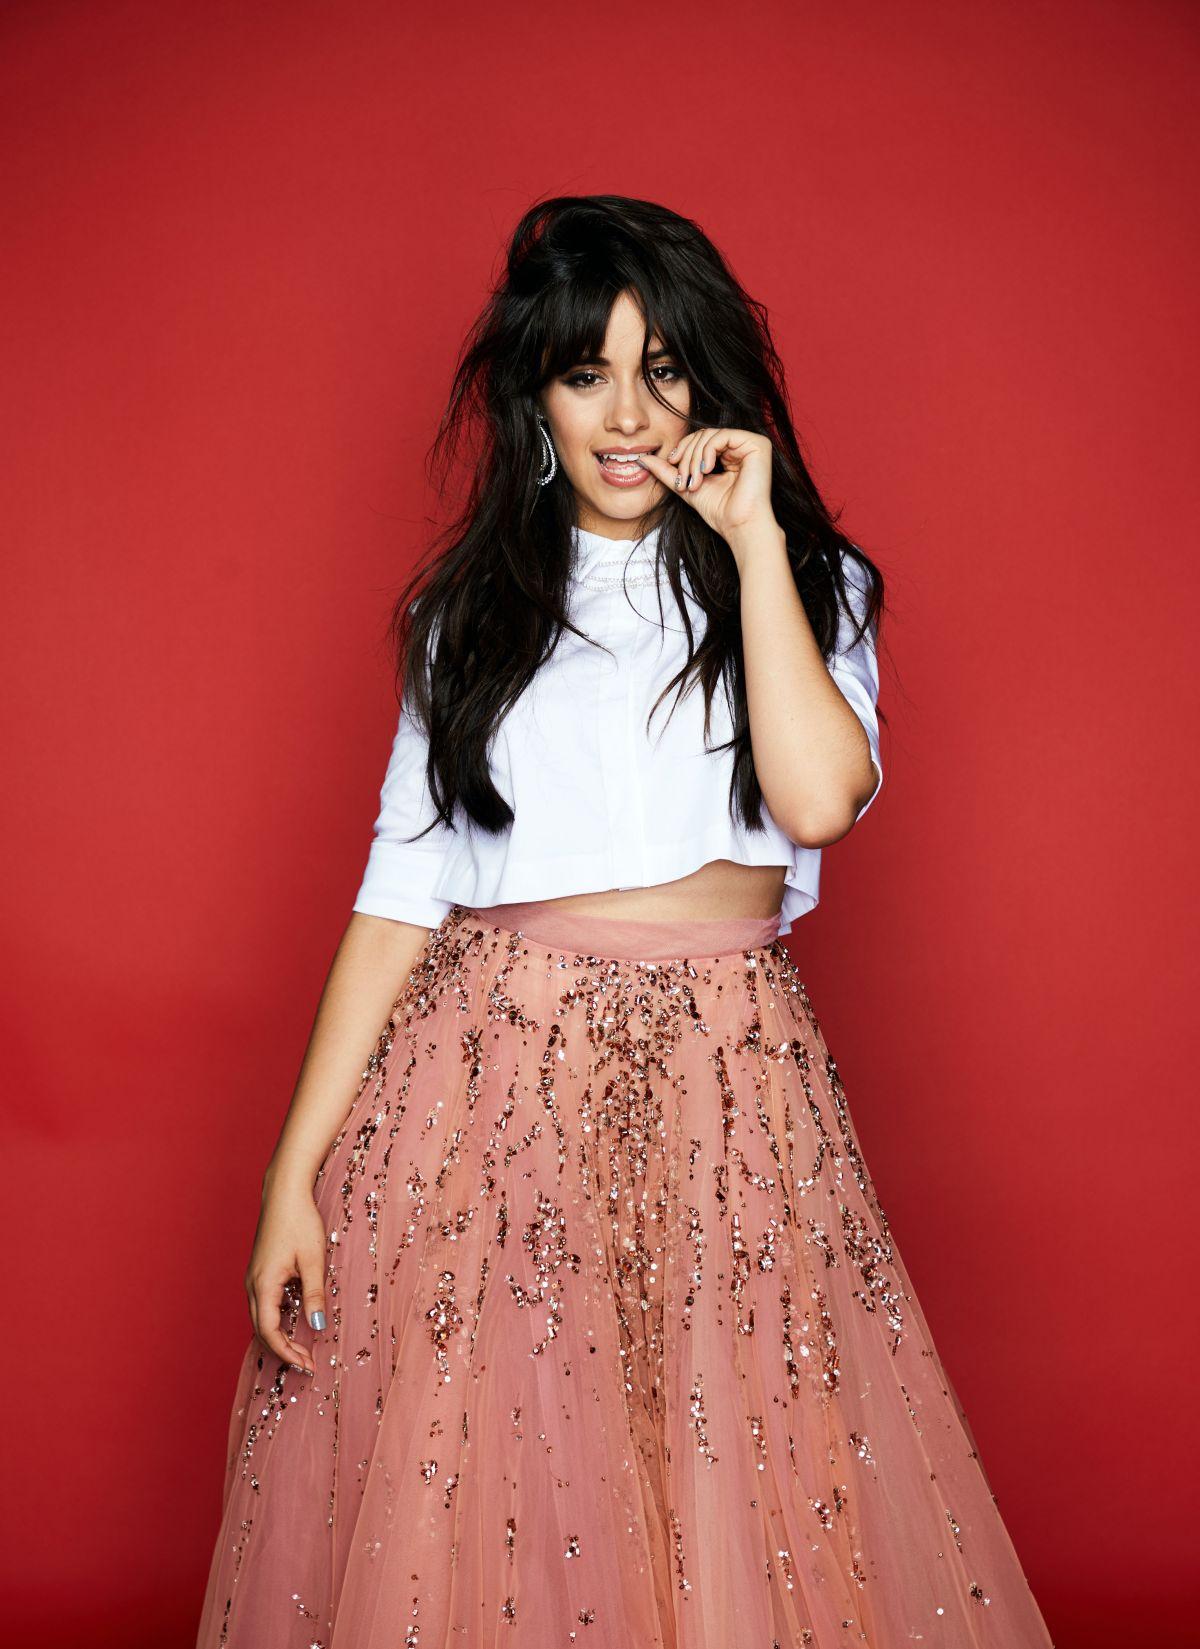 Camila Cabello Attends 102.7 KIIS FMs Jingle Ball in